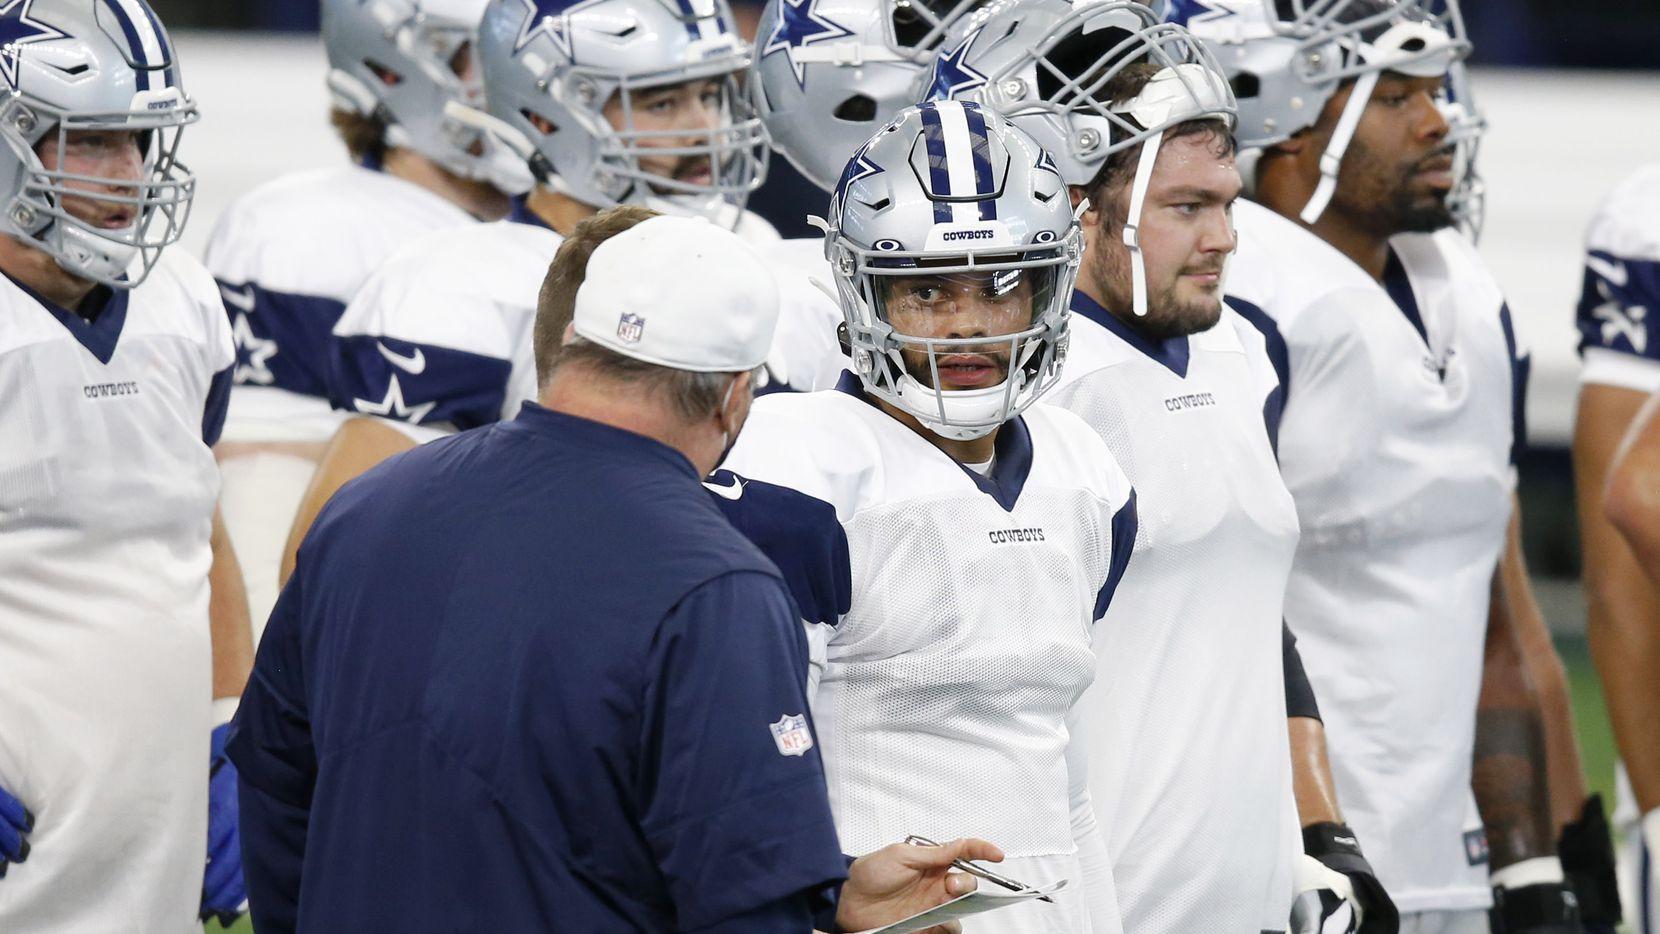 Dallas Cowboys quarterback Dak Prescott (4) talks with Dallas Cowboys head coach Mike McCarthy in practice on Cowboys Night during training camp at AT&T Stadium in Arlington, Texas on Sunday, August 30, 2020.